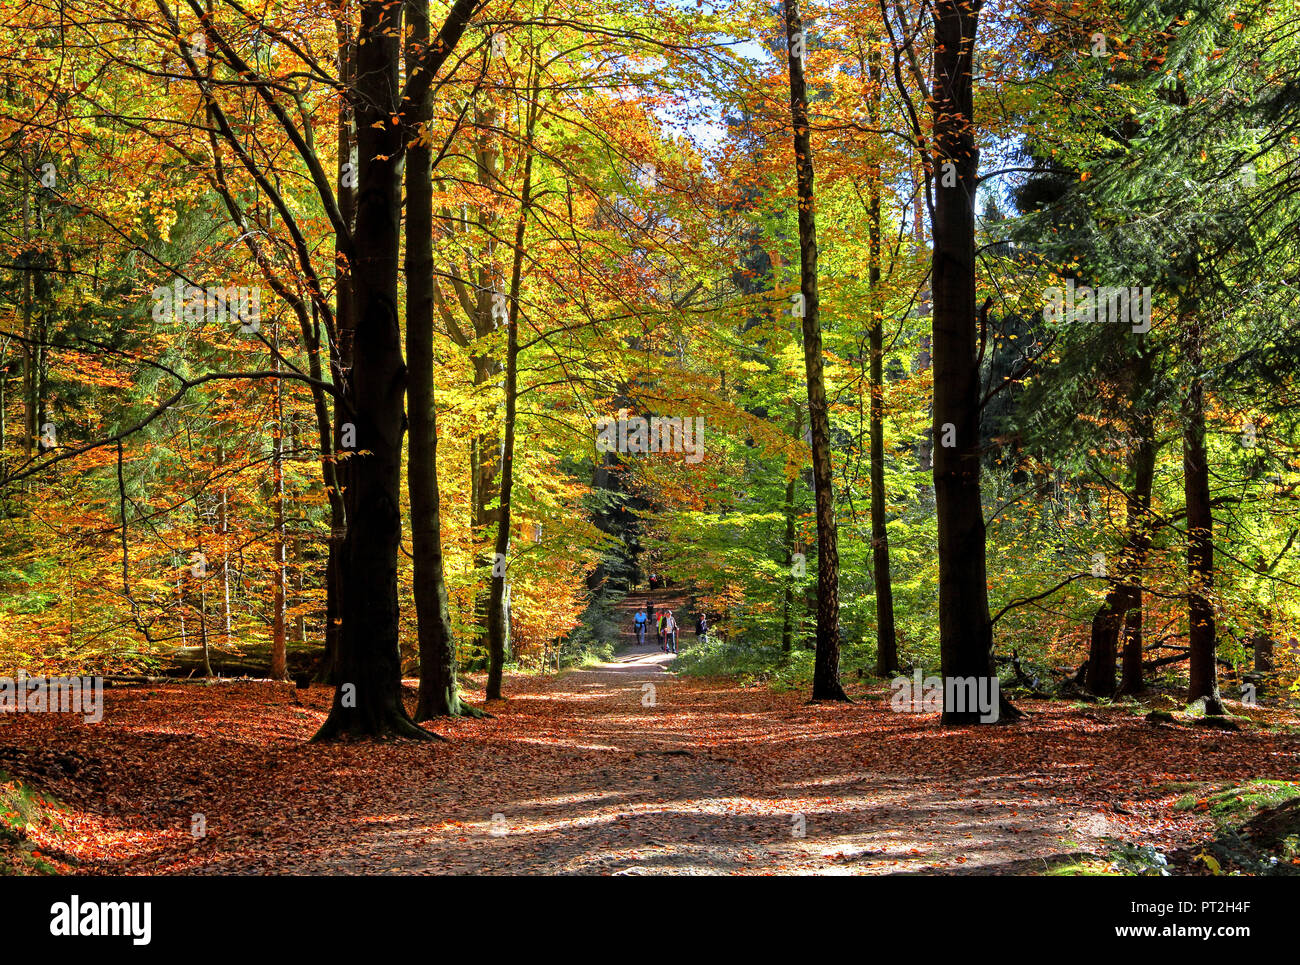 Forest path through beech forest at Hinterhermsdorf, Elbe Sandstone Mountains, Saxon Switzerland, Saxony, Germany Stock Photo